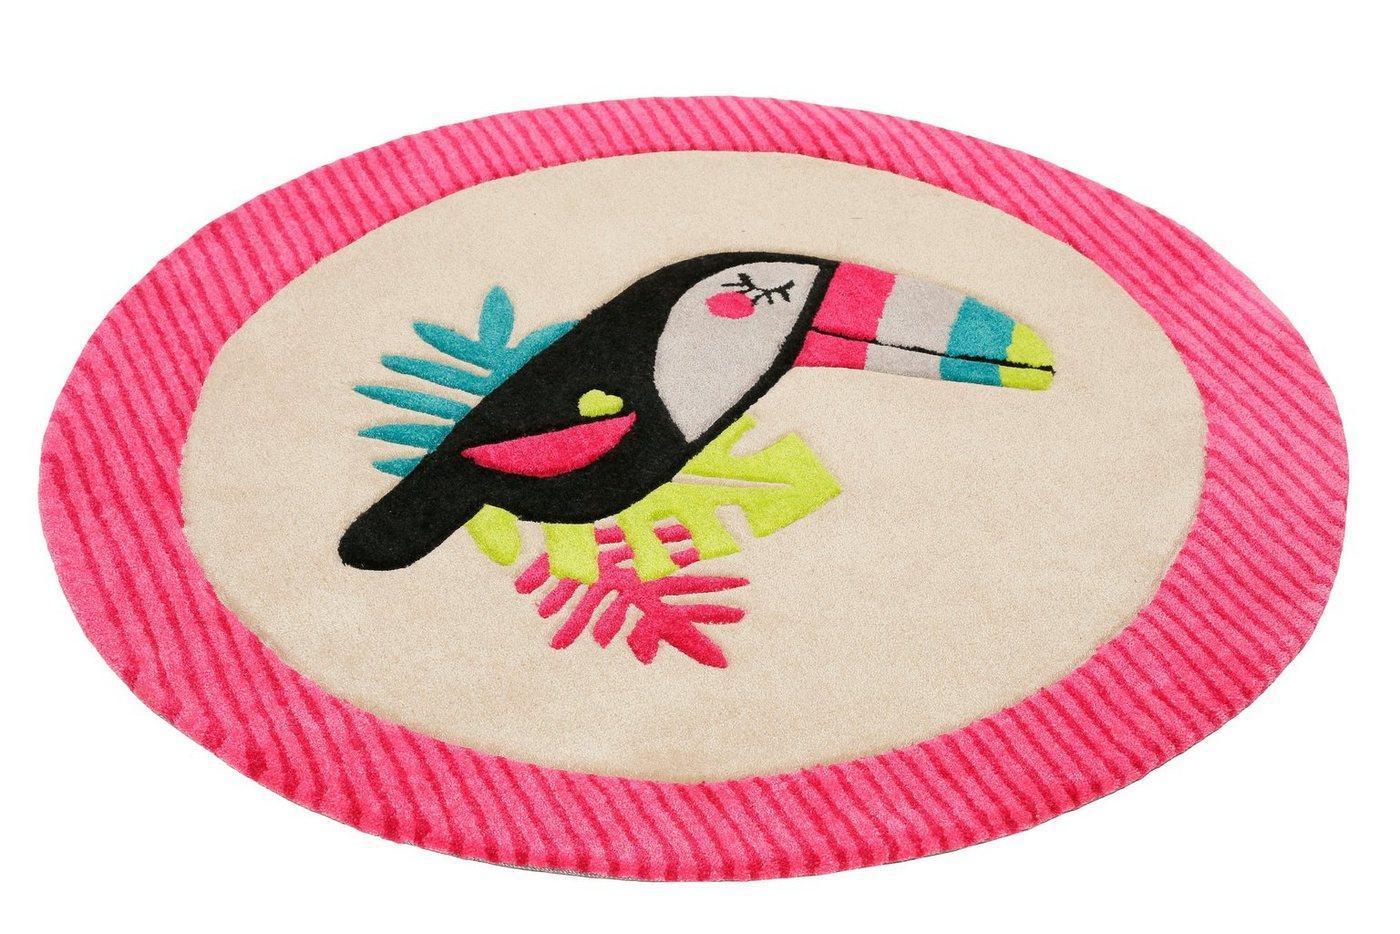 Kinderteppich »E-Toucan«, Esprit, rund, Höhe 9 mm, besonders weich, Motiv Toucan, rosa